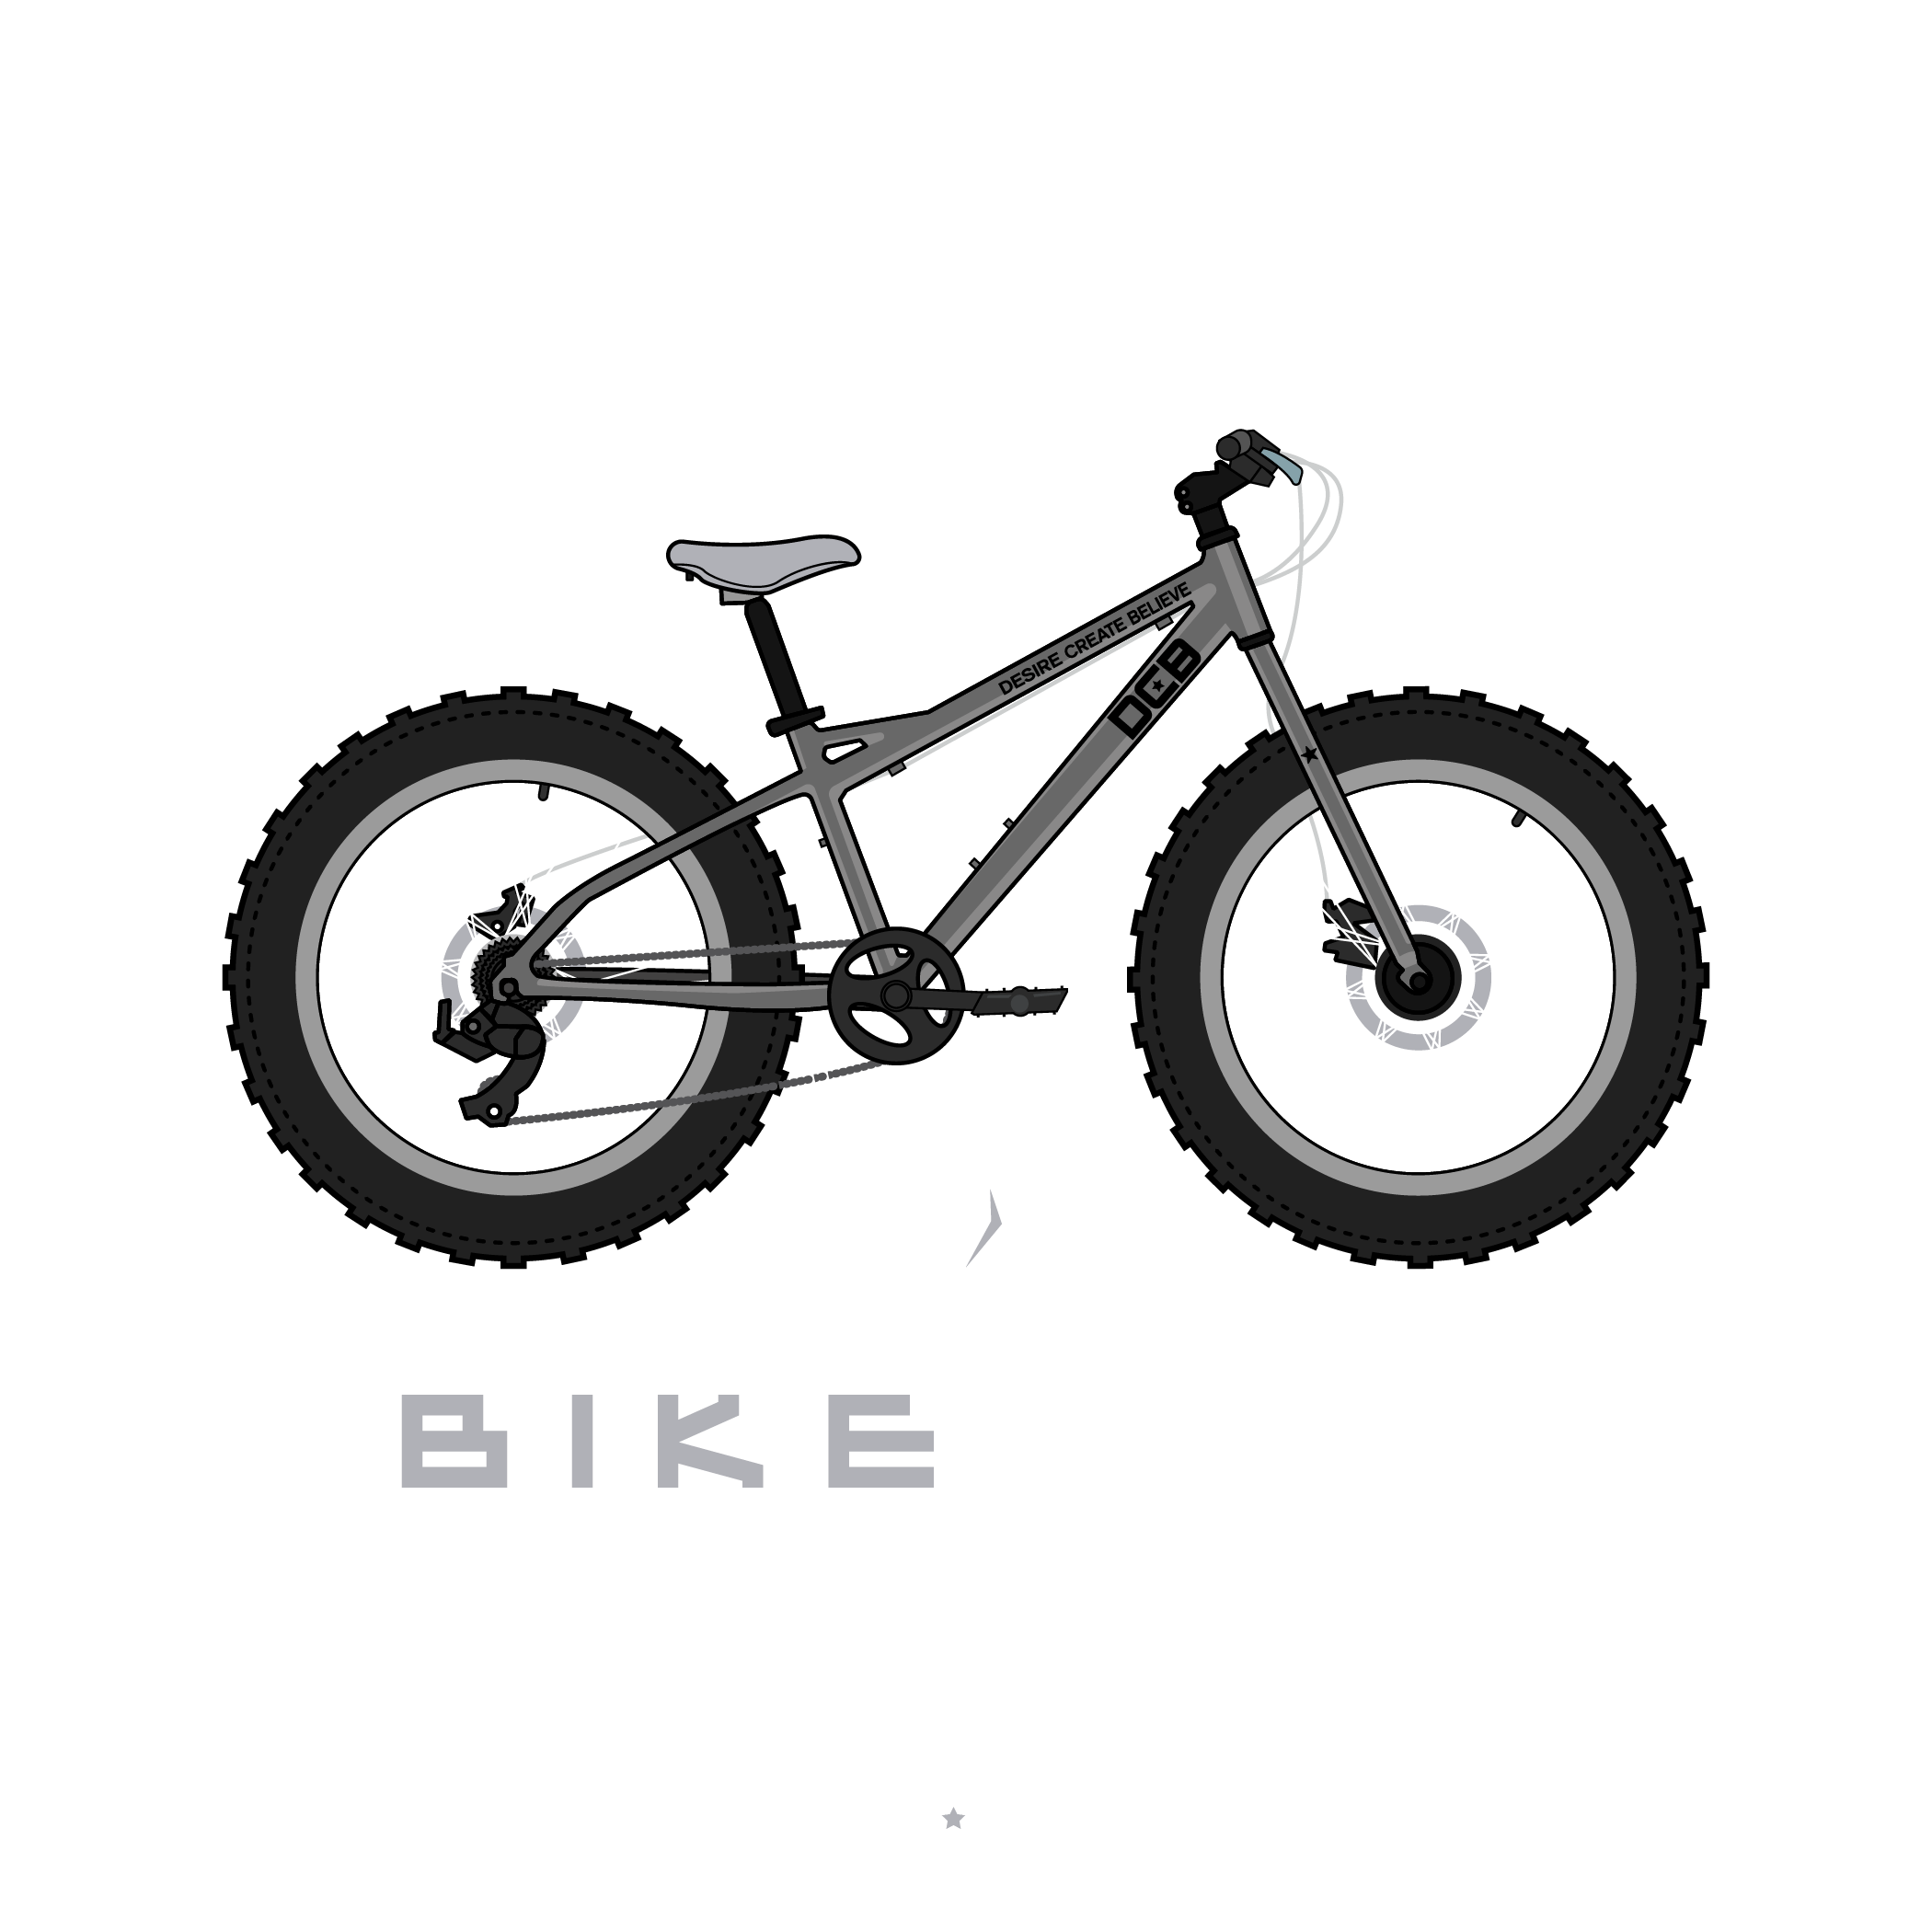 Bike Life Fatbike Stealth_Artboard.png